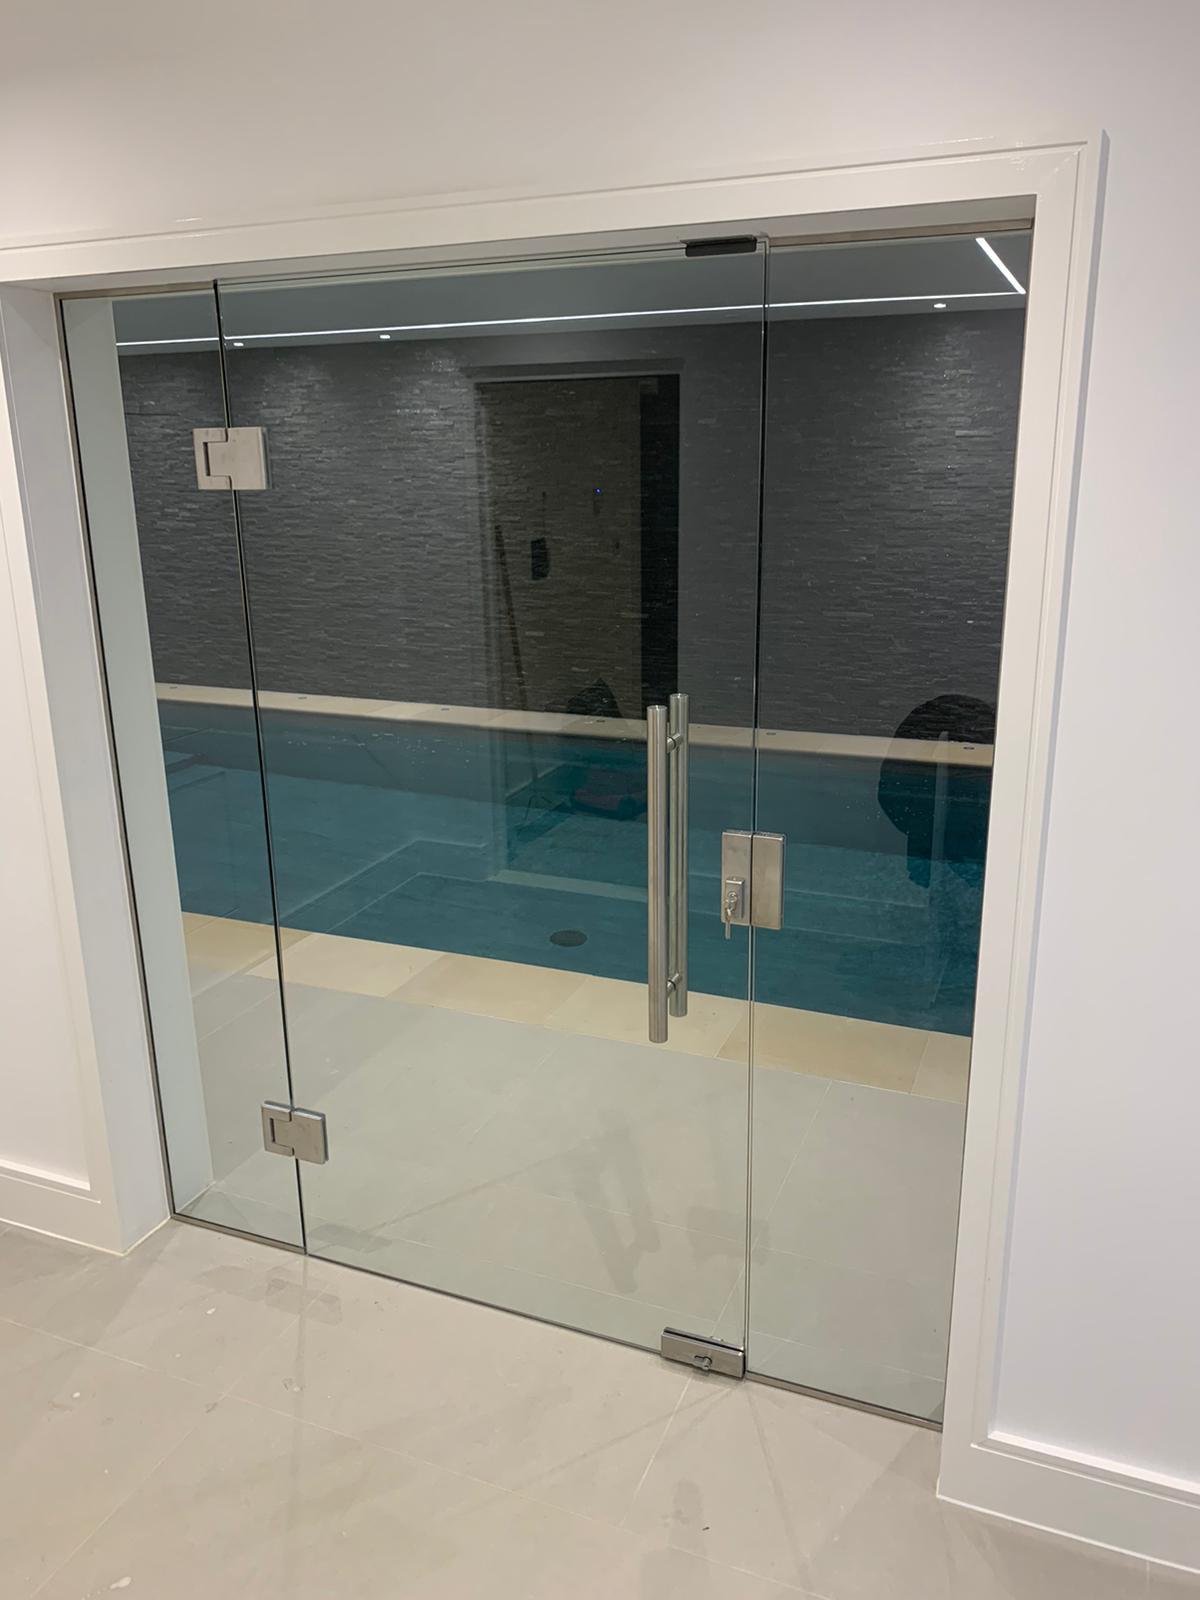 Swimming pool internal glass doors